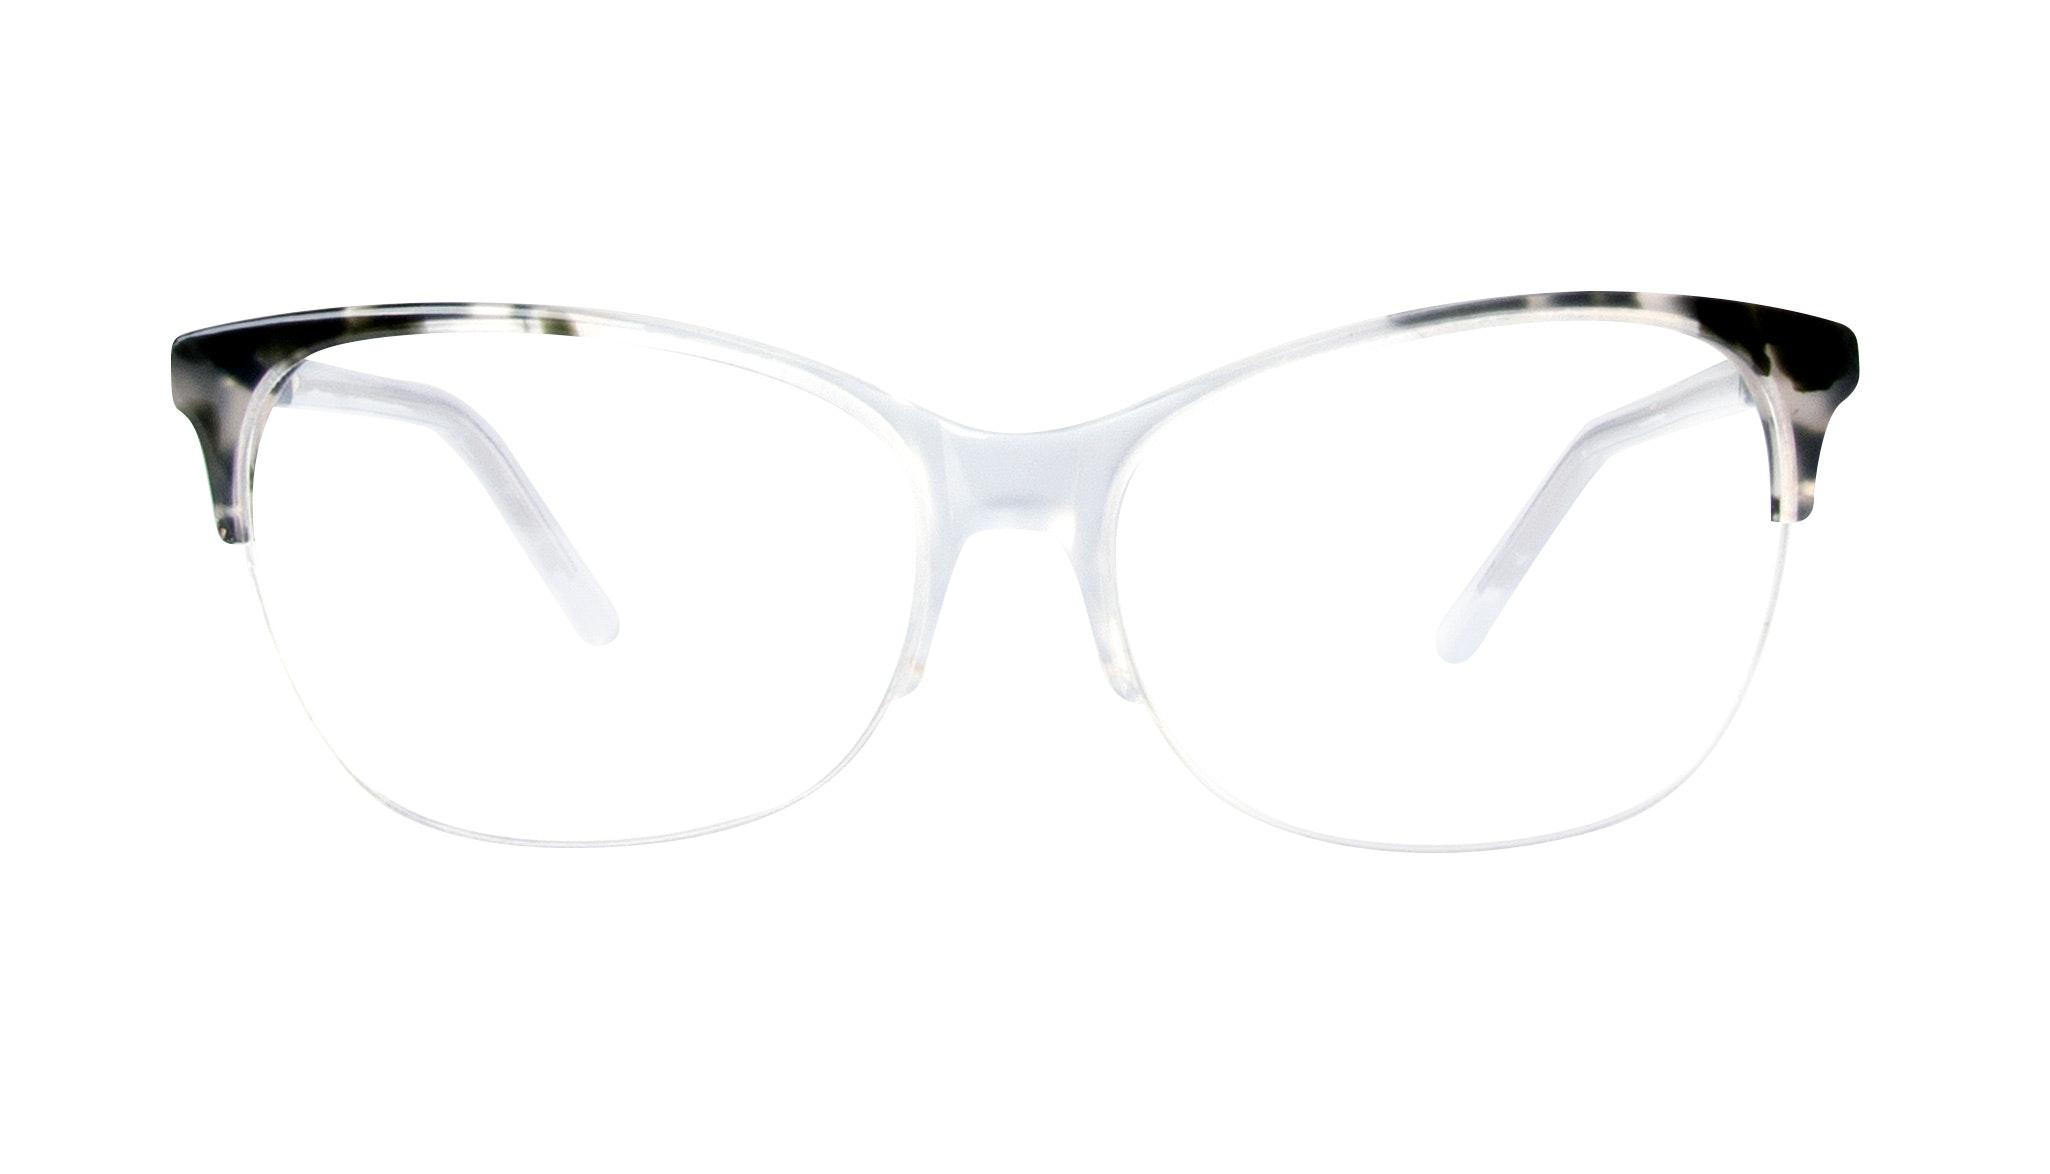 Affordable Fashion Glasses Cat Eye Rectangle Semi-Rimless Eyeglasses Women Flair Light Smokey Tort Front